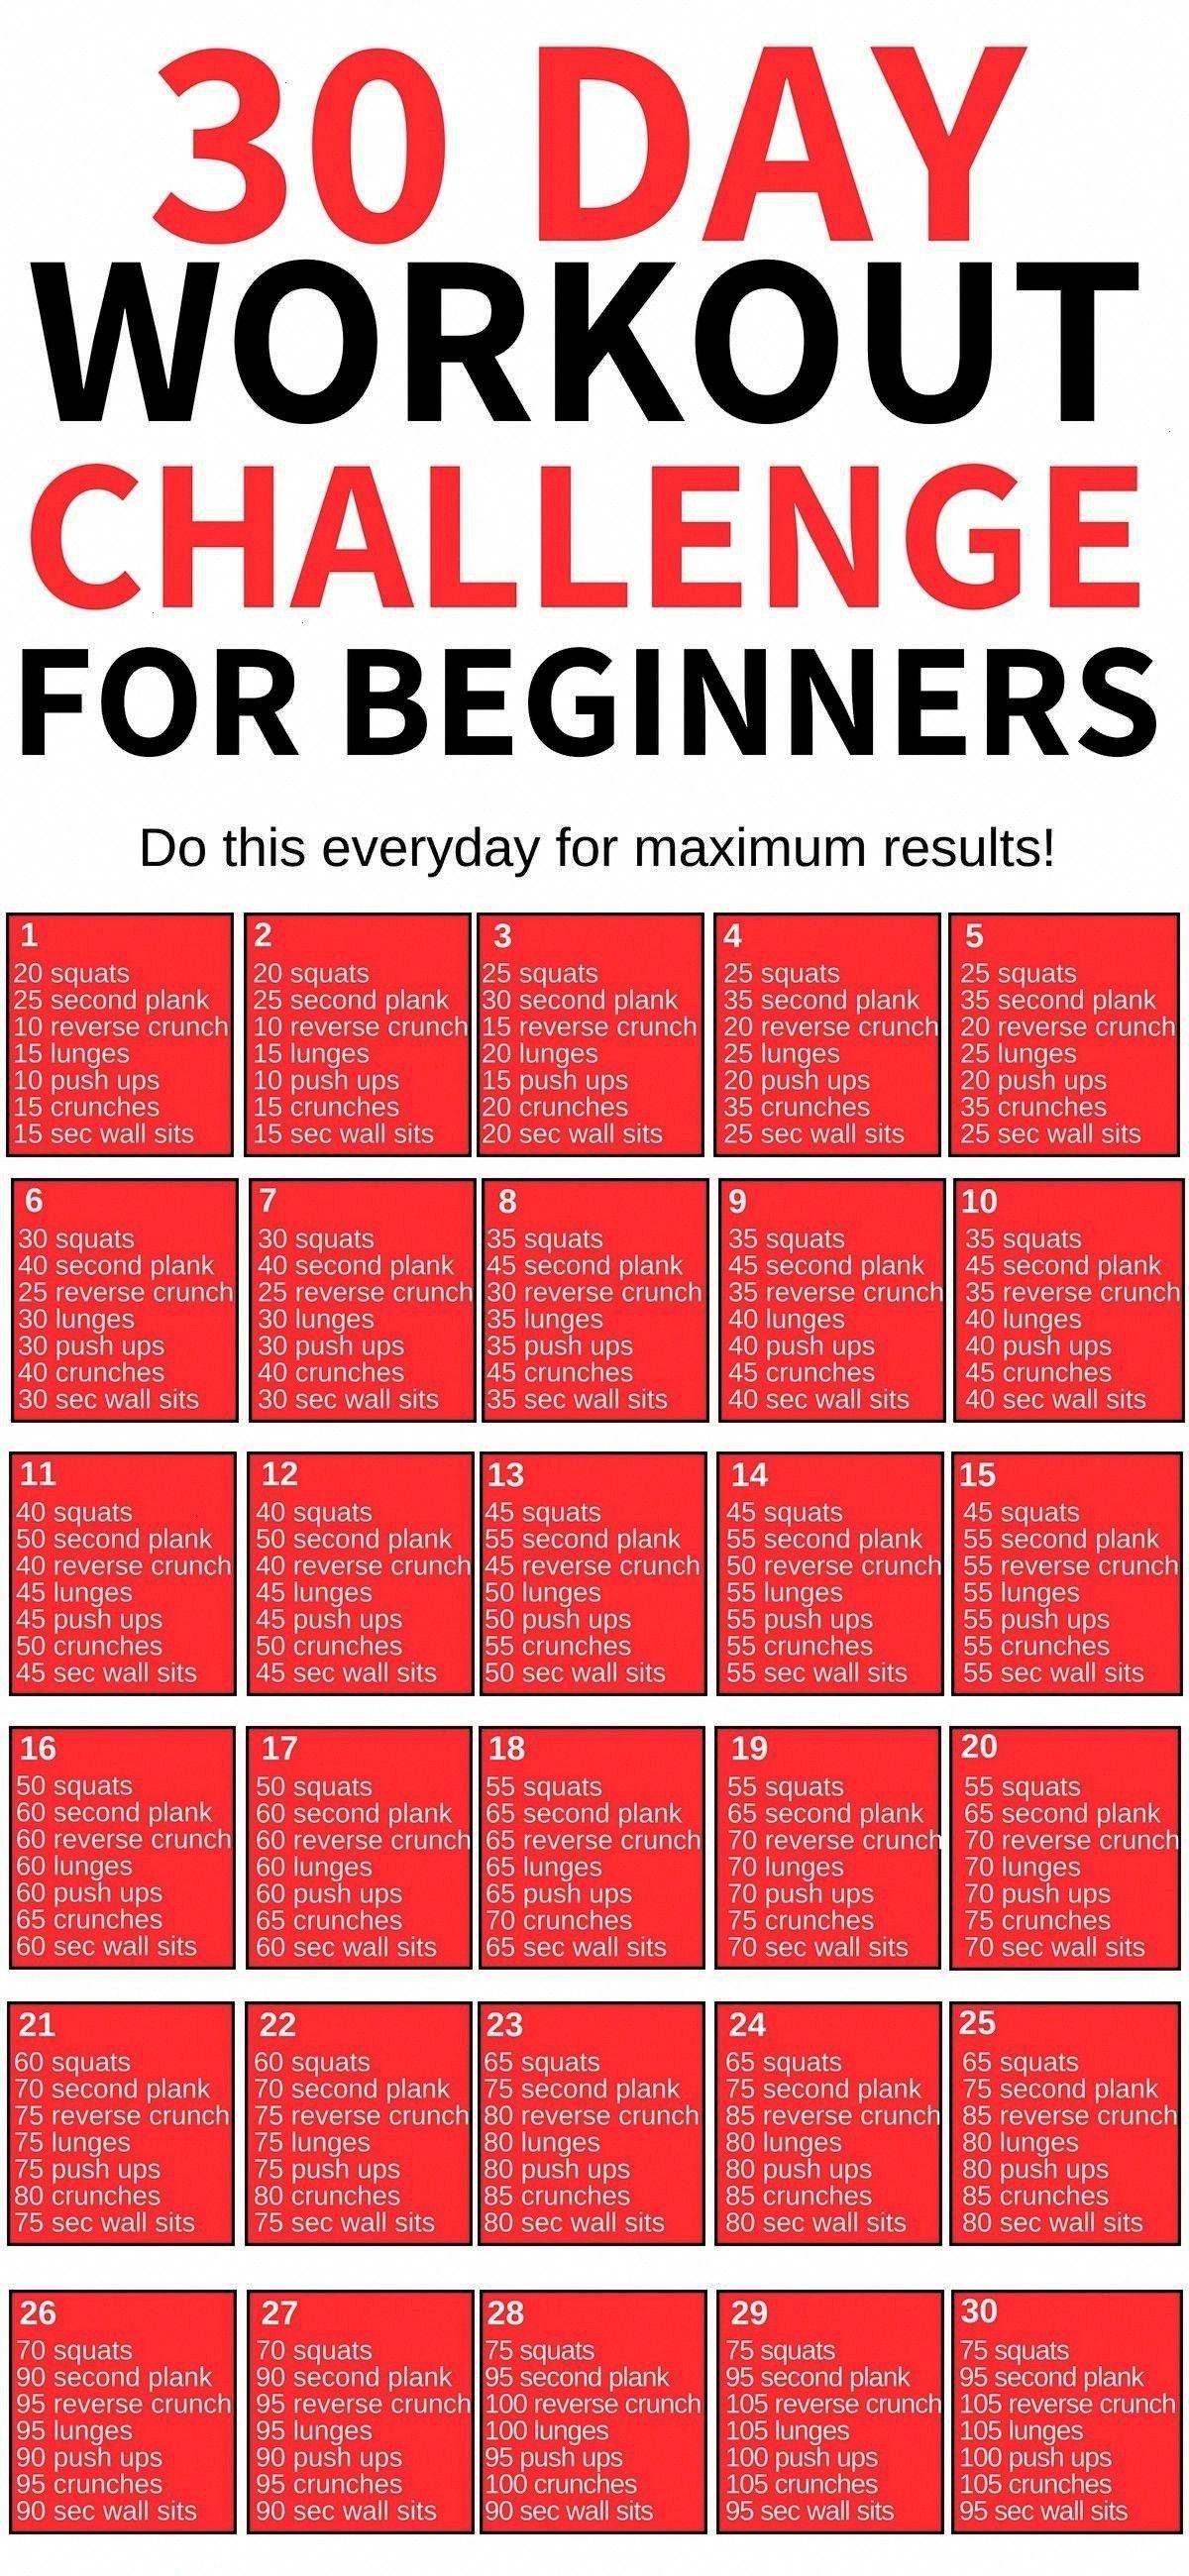 #workoutchallenge #fitnesschallenge #definitely #challenge #beginners #laterthis #bestthis #awesome...